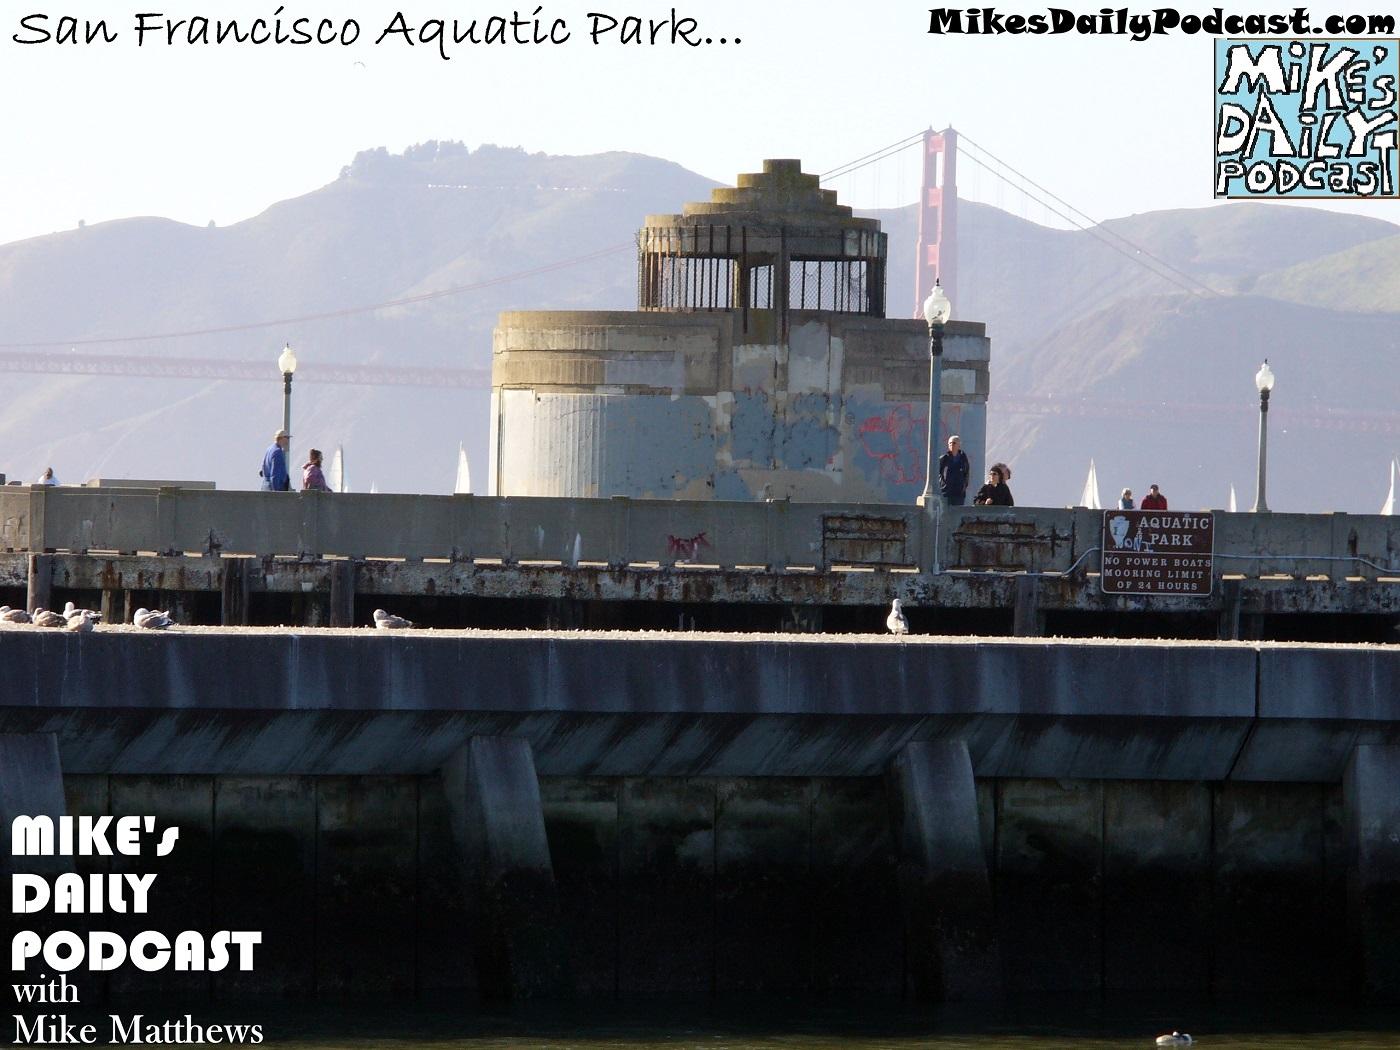 MIKEs DAILY PODCAST 1046 San Francisco Aquatic Park